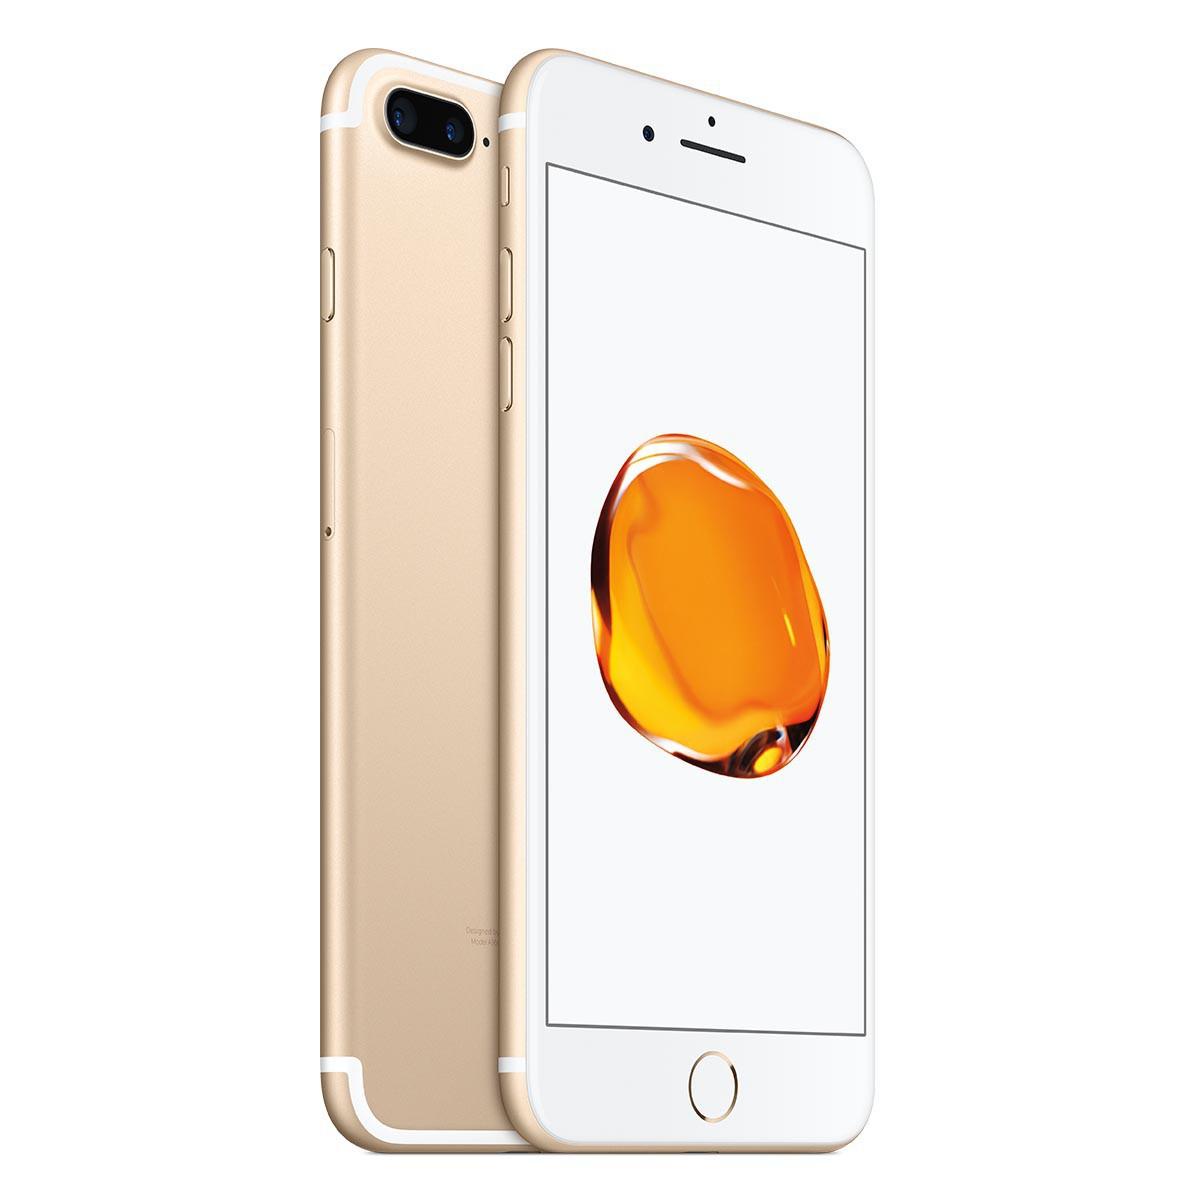 72282e5bba9 iPhone 7 Plus 128GB Gold